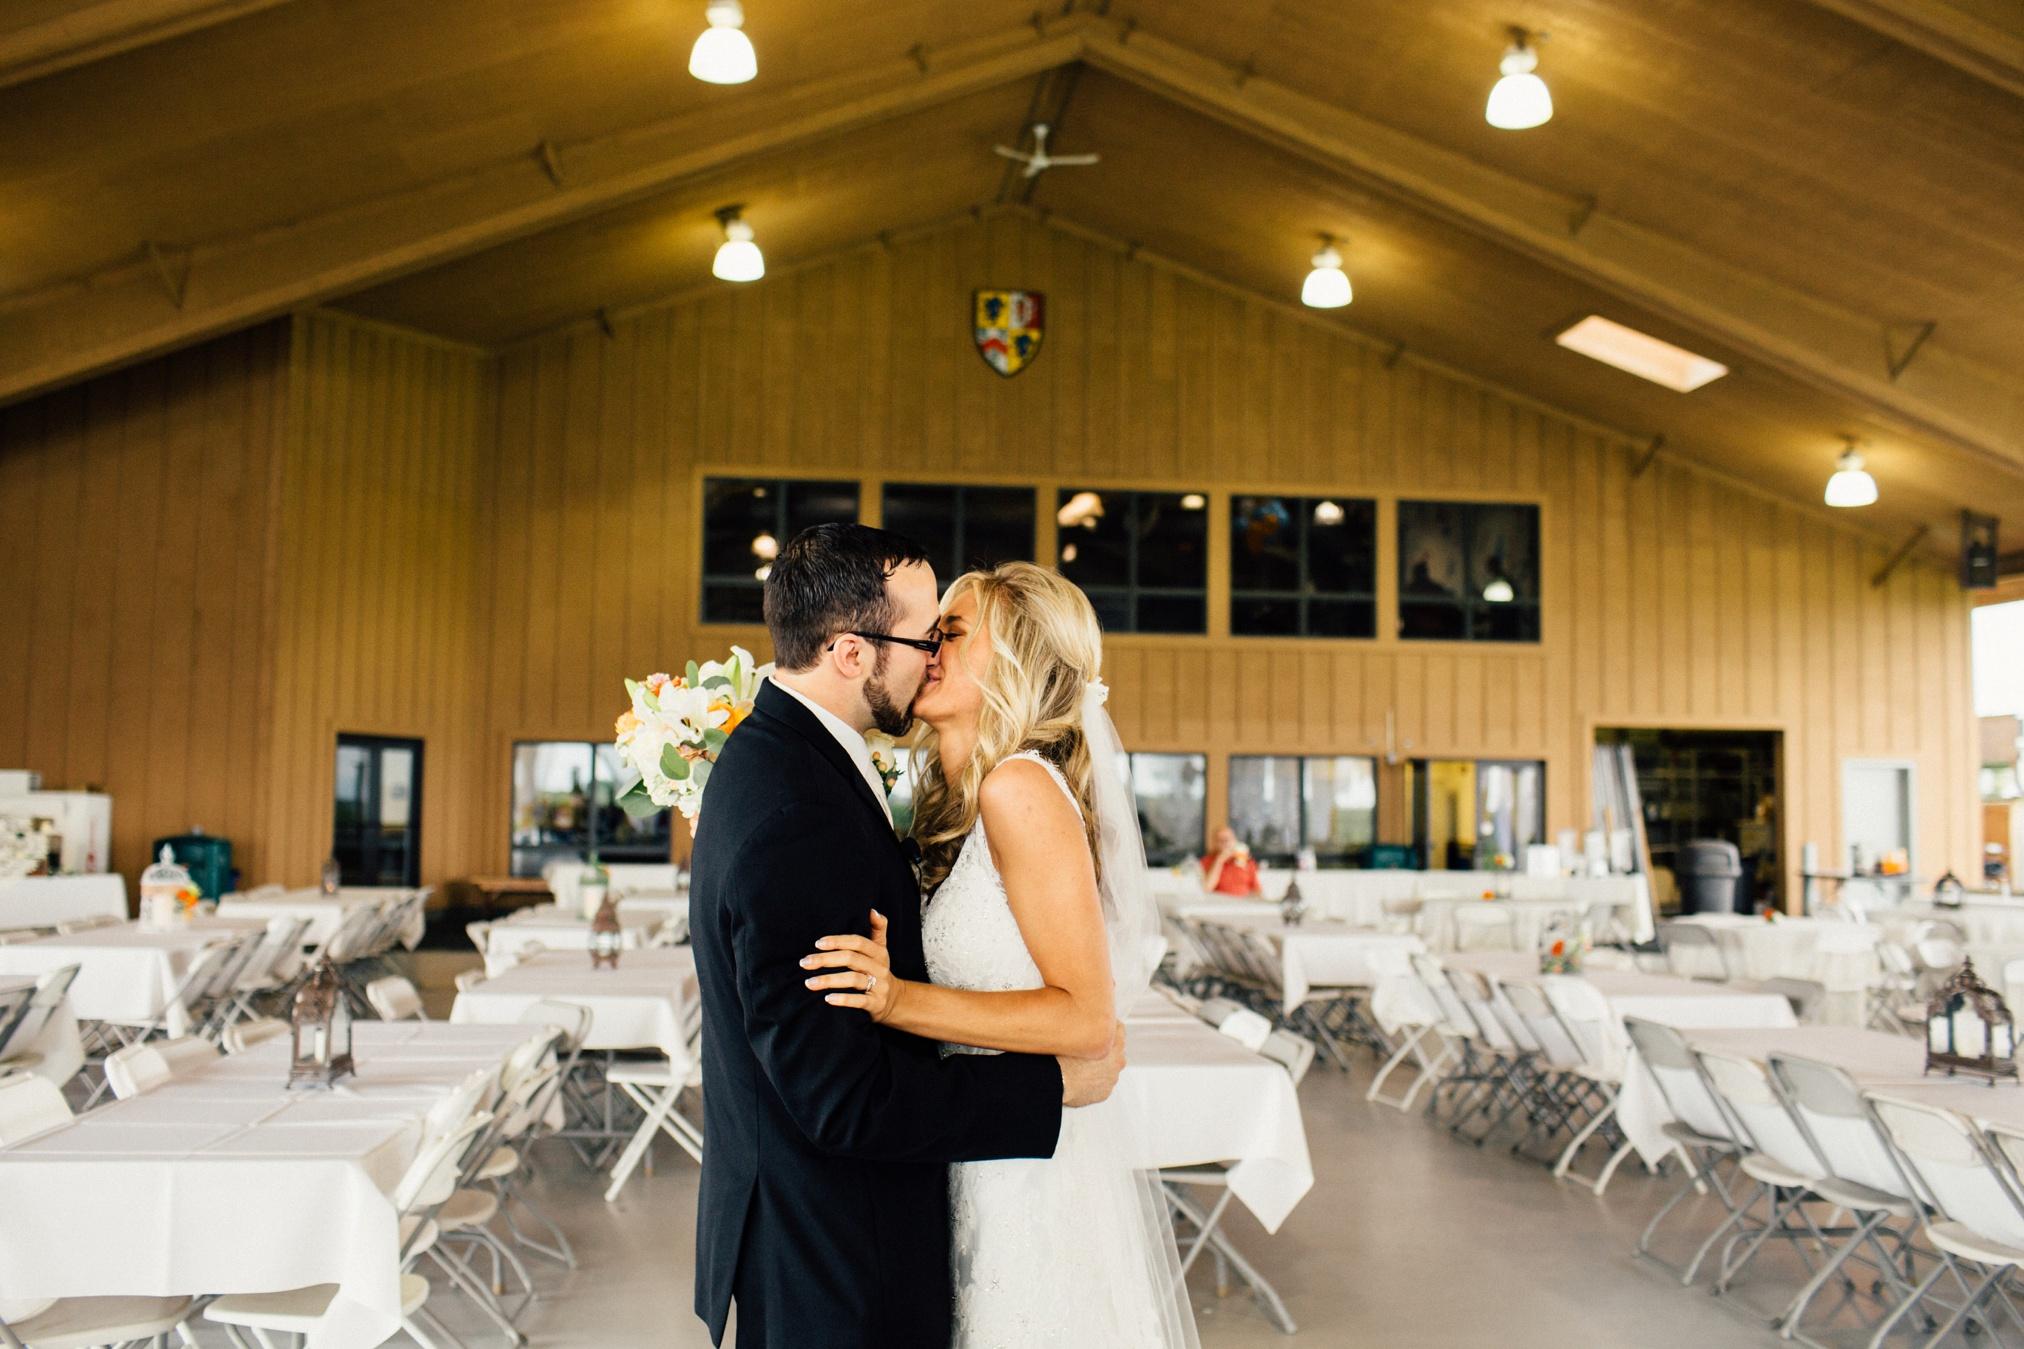 schmid_wedding-575.jpg